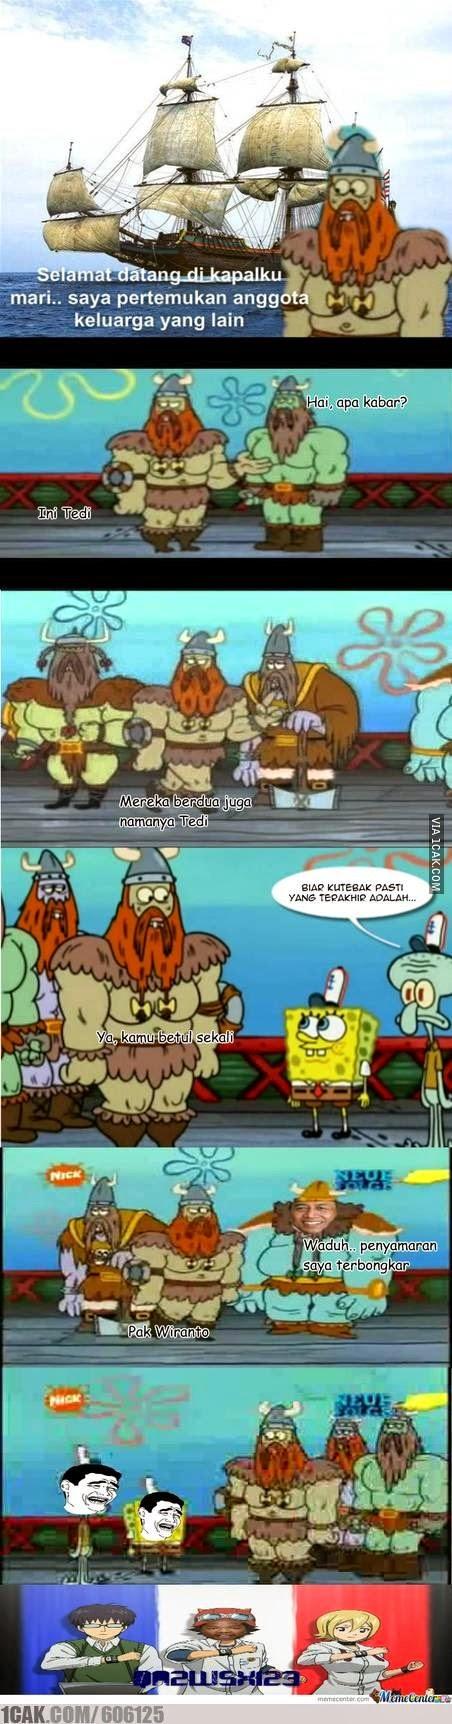 Meme Lucu Wiranto Menyamar 3